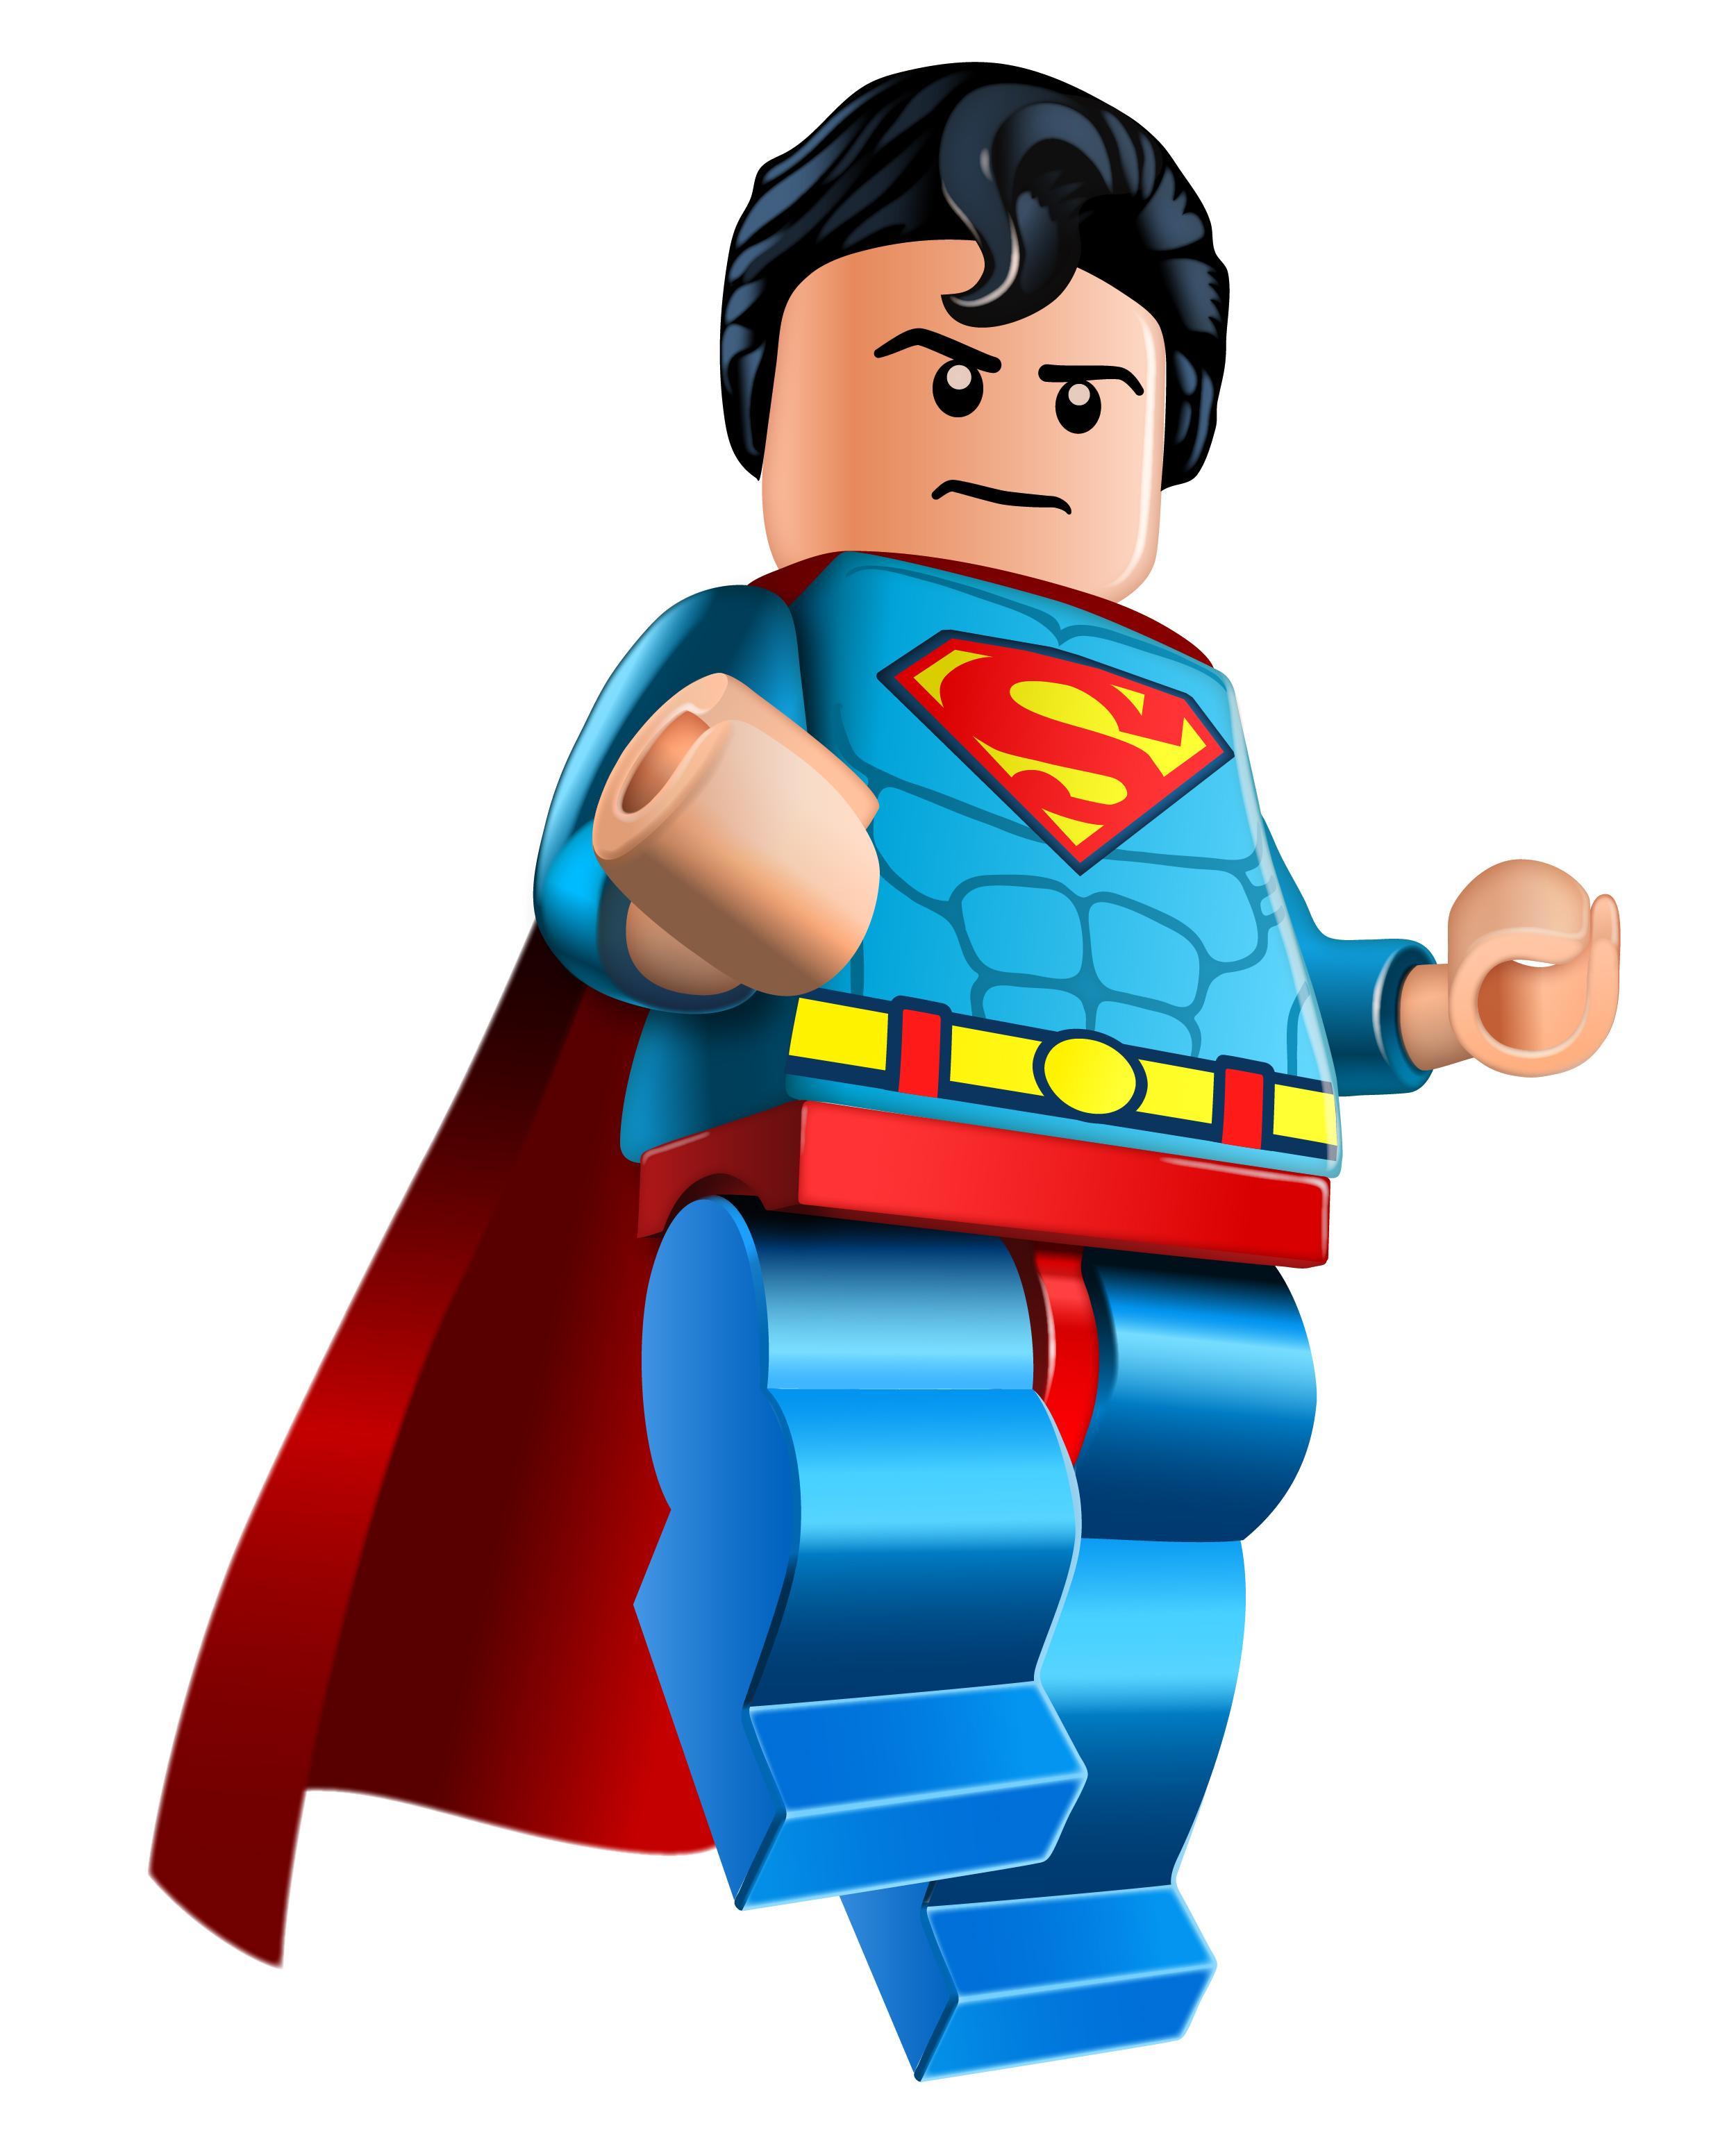 Lego clipart superman cartoon Skillshare er Projects Man 0a0a76c4